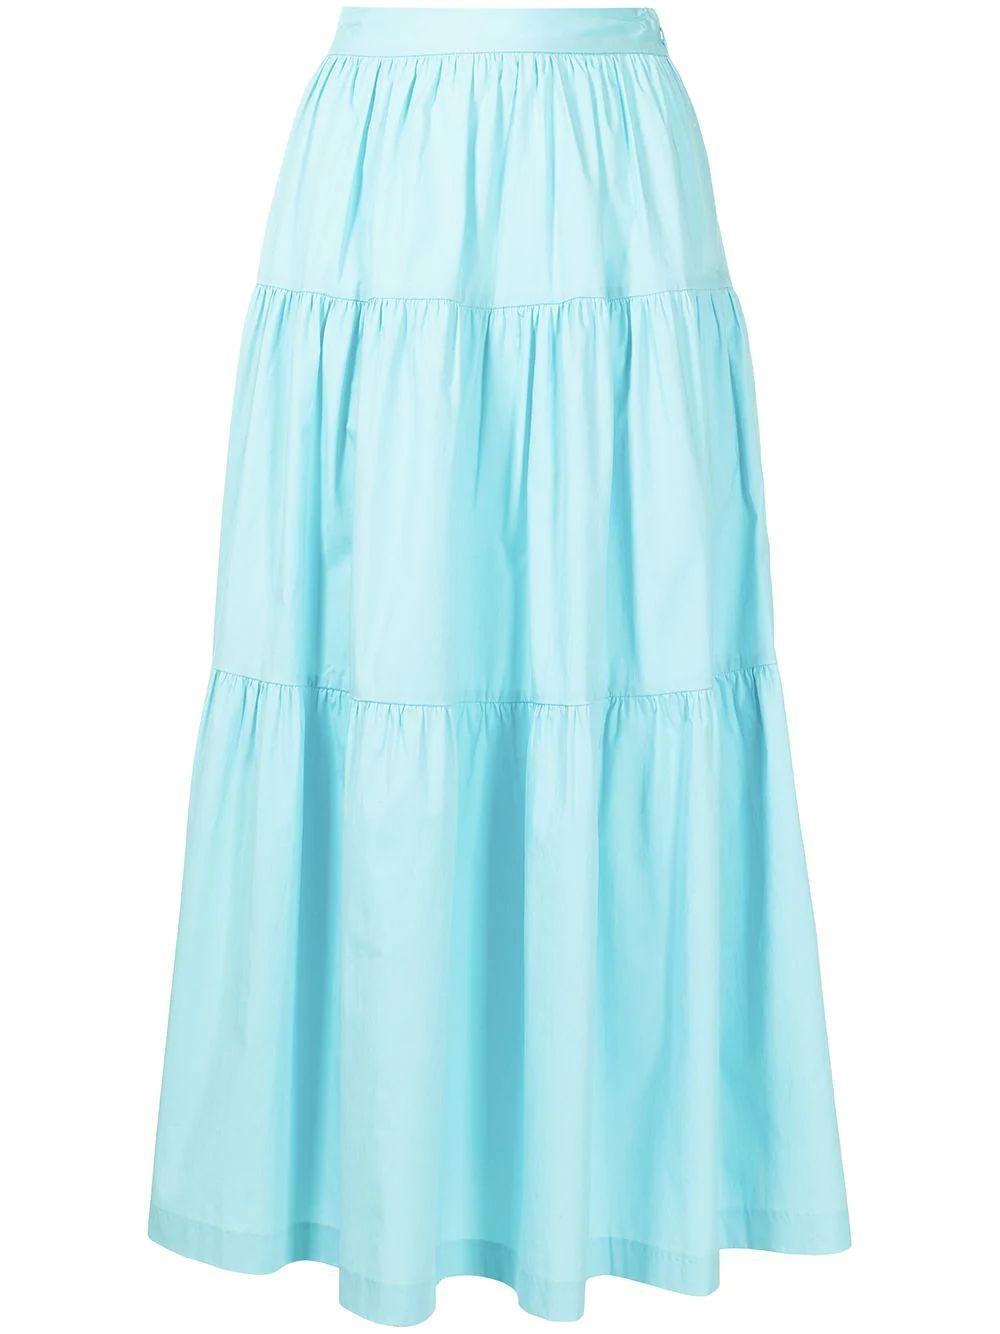 Sea Maxi Skirt